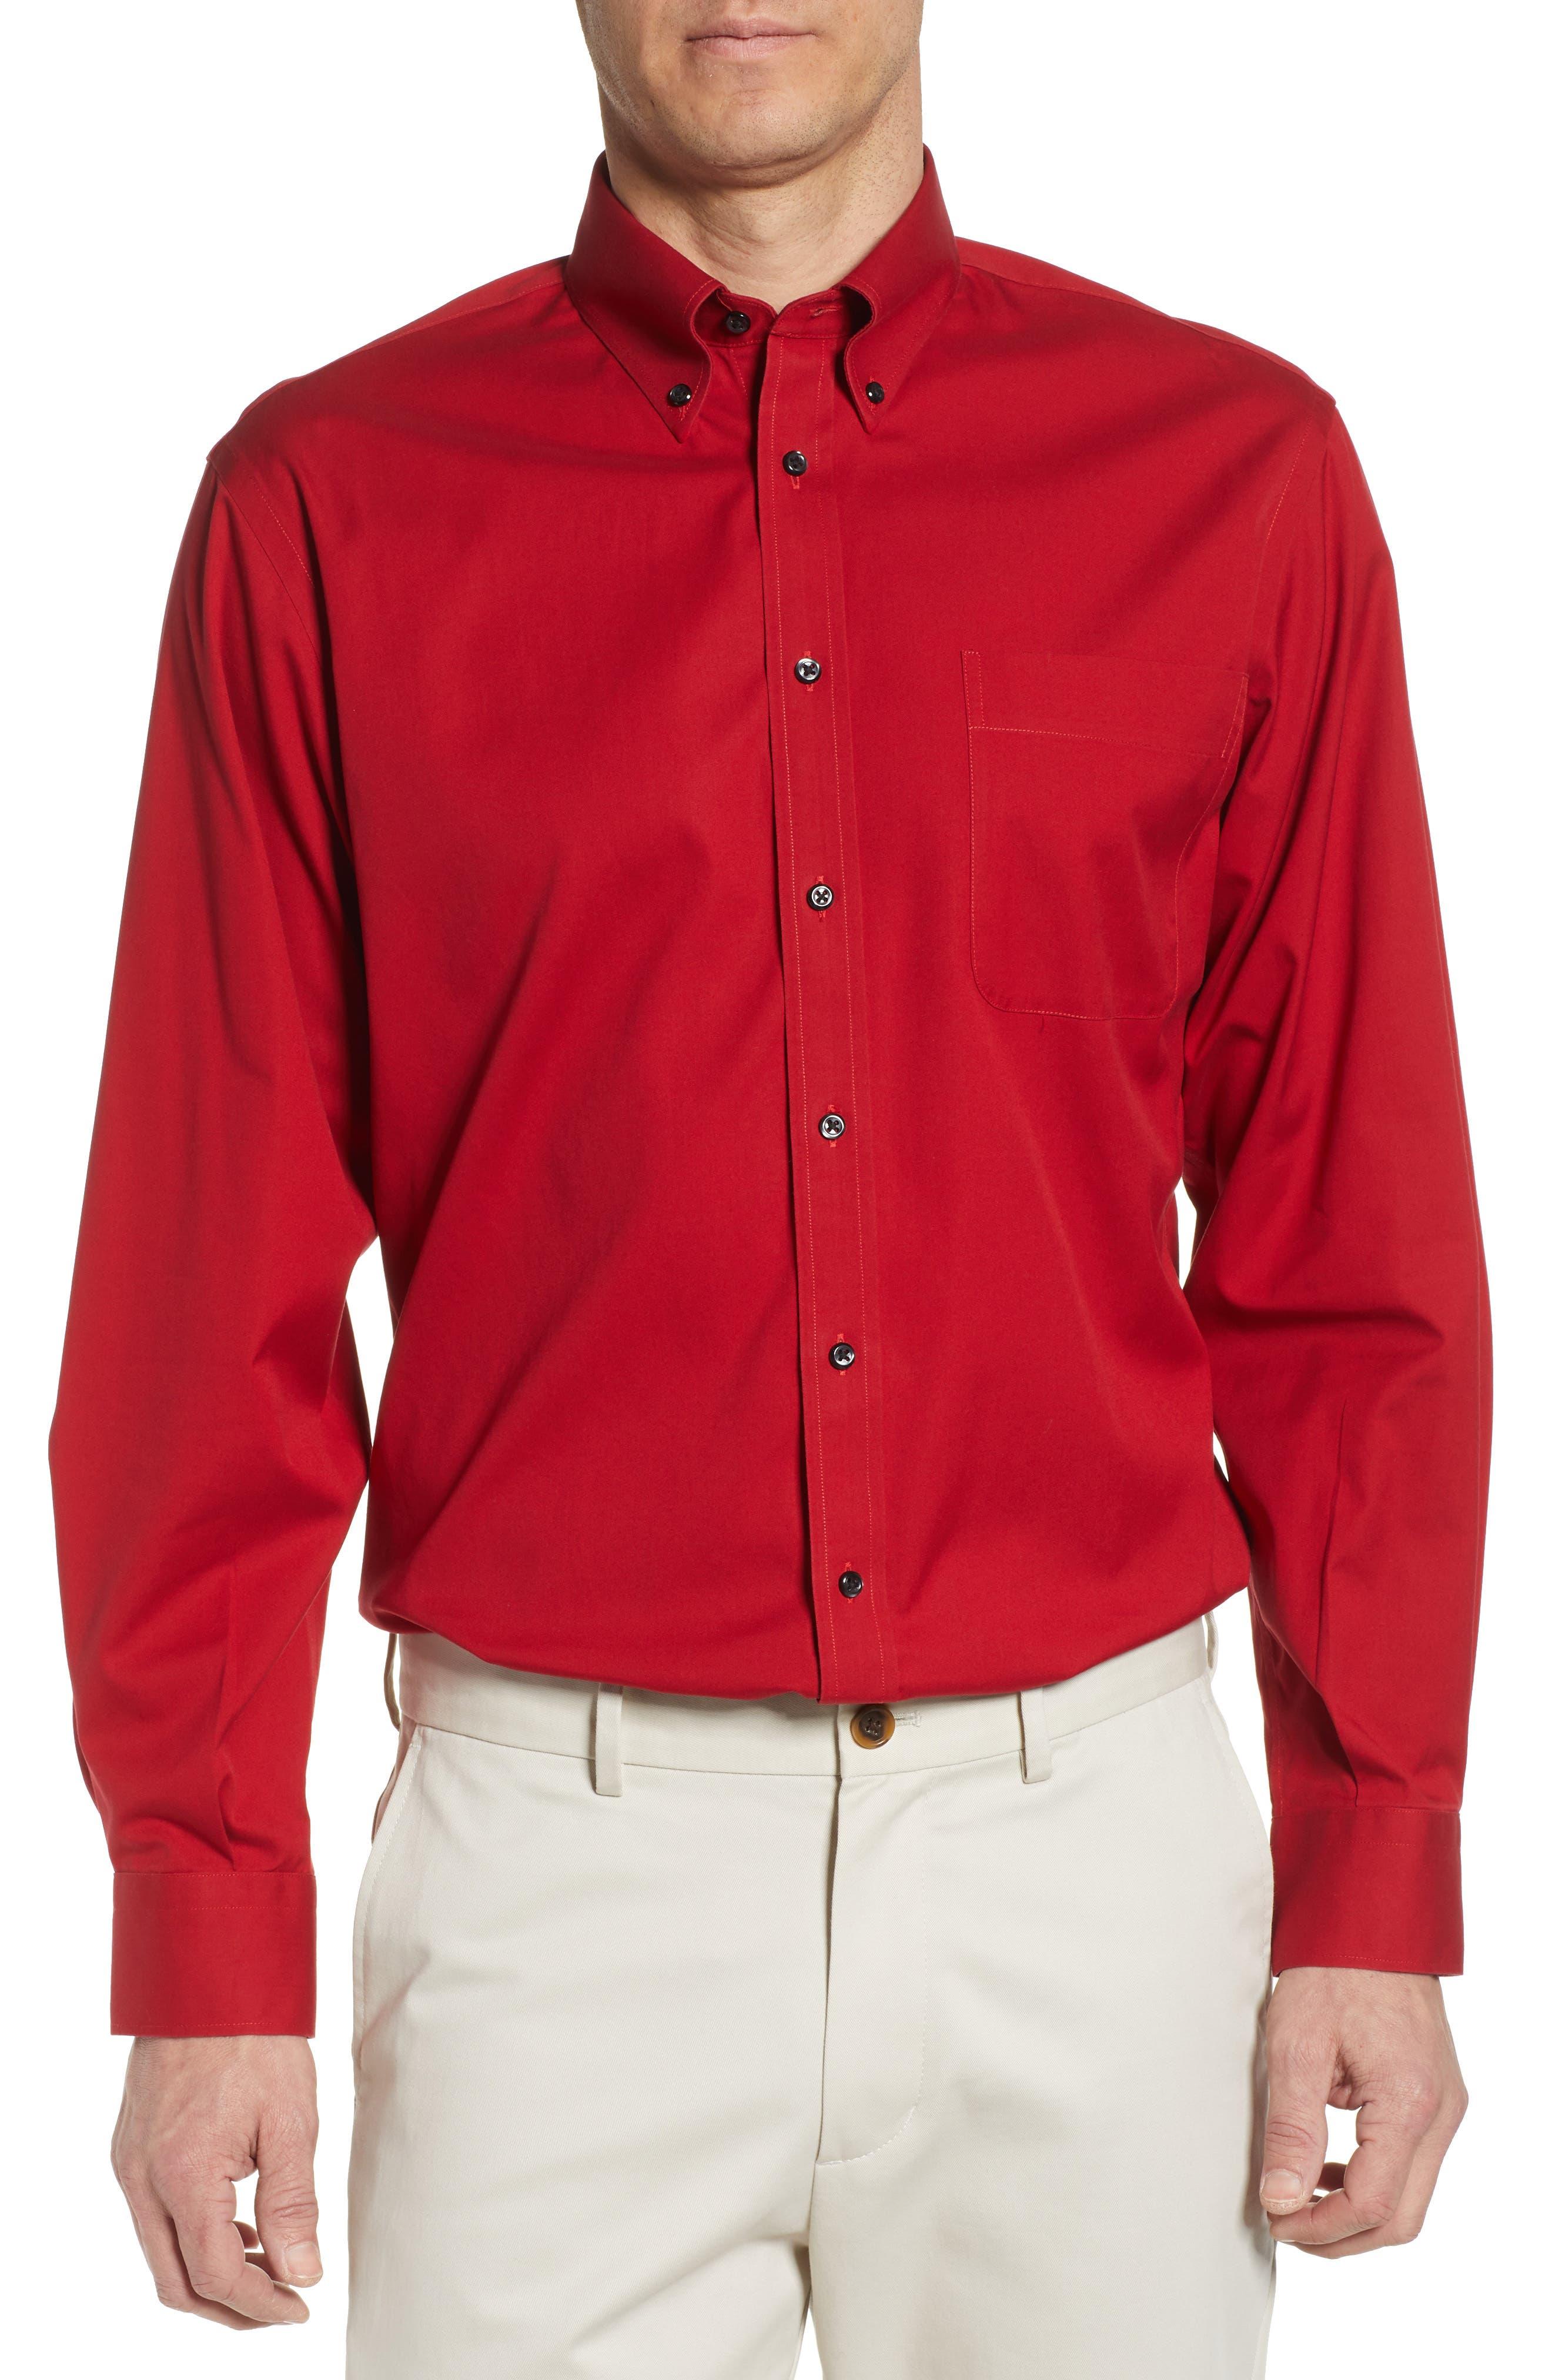 Nordstrom Shop Smartcare(TM) Classic Fit Dress Shirt, Red